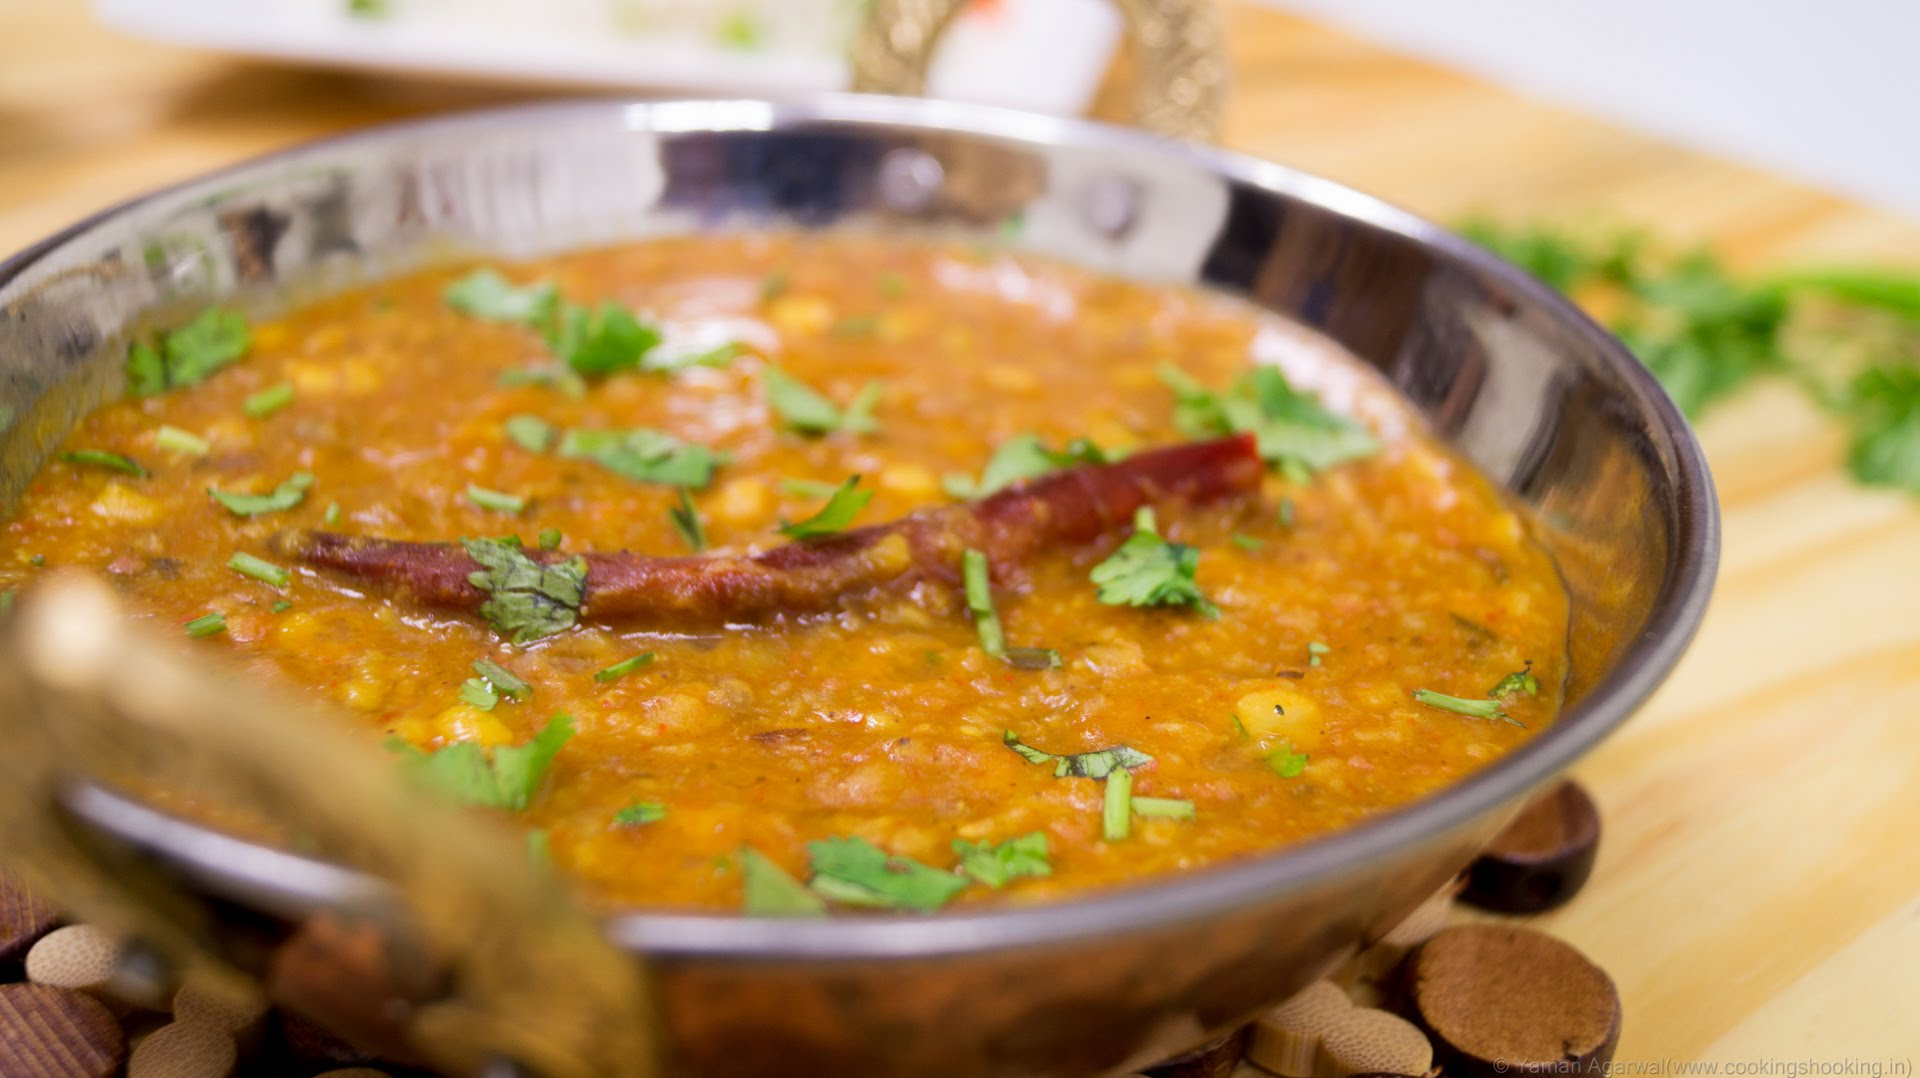 tadka dal, sopa vegana, sopa ayurveda, sopa tridoshica, sopa vata, sopa kapha, sopa pitta, dal, mung dal, soja verde, clases cocina india, clases cocina vegana, clase cocina ayurveda, clase cocina vegana, clase cocina india, malaga